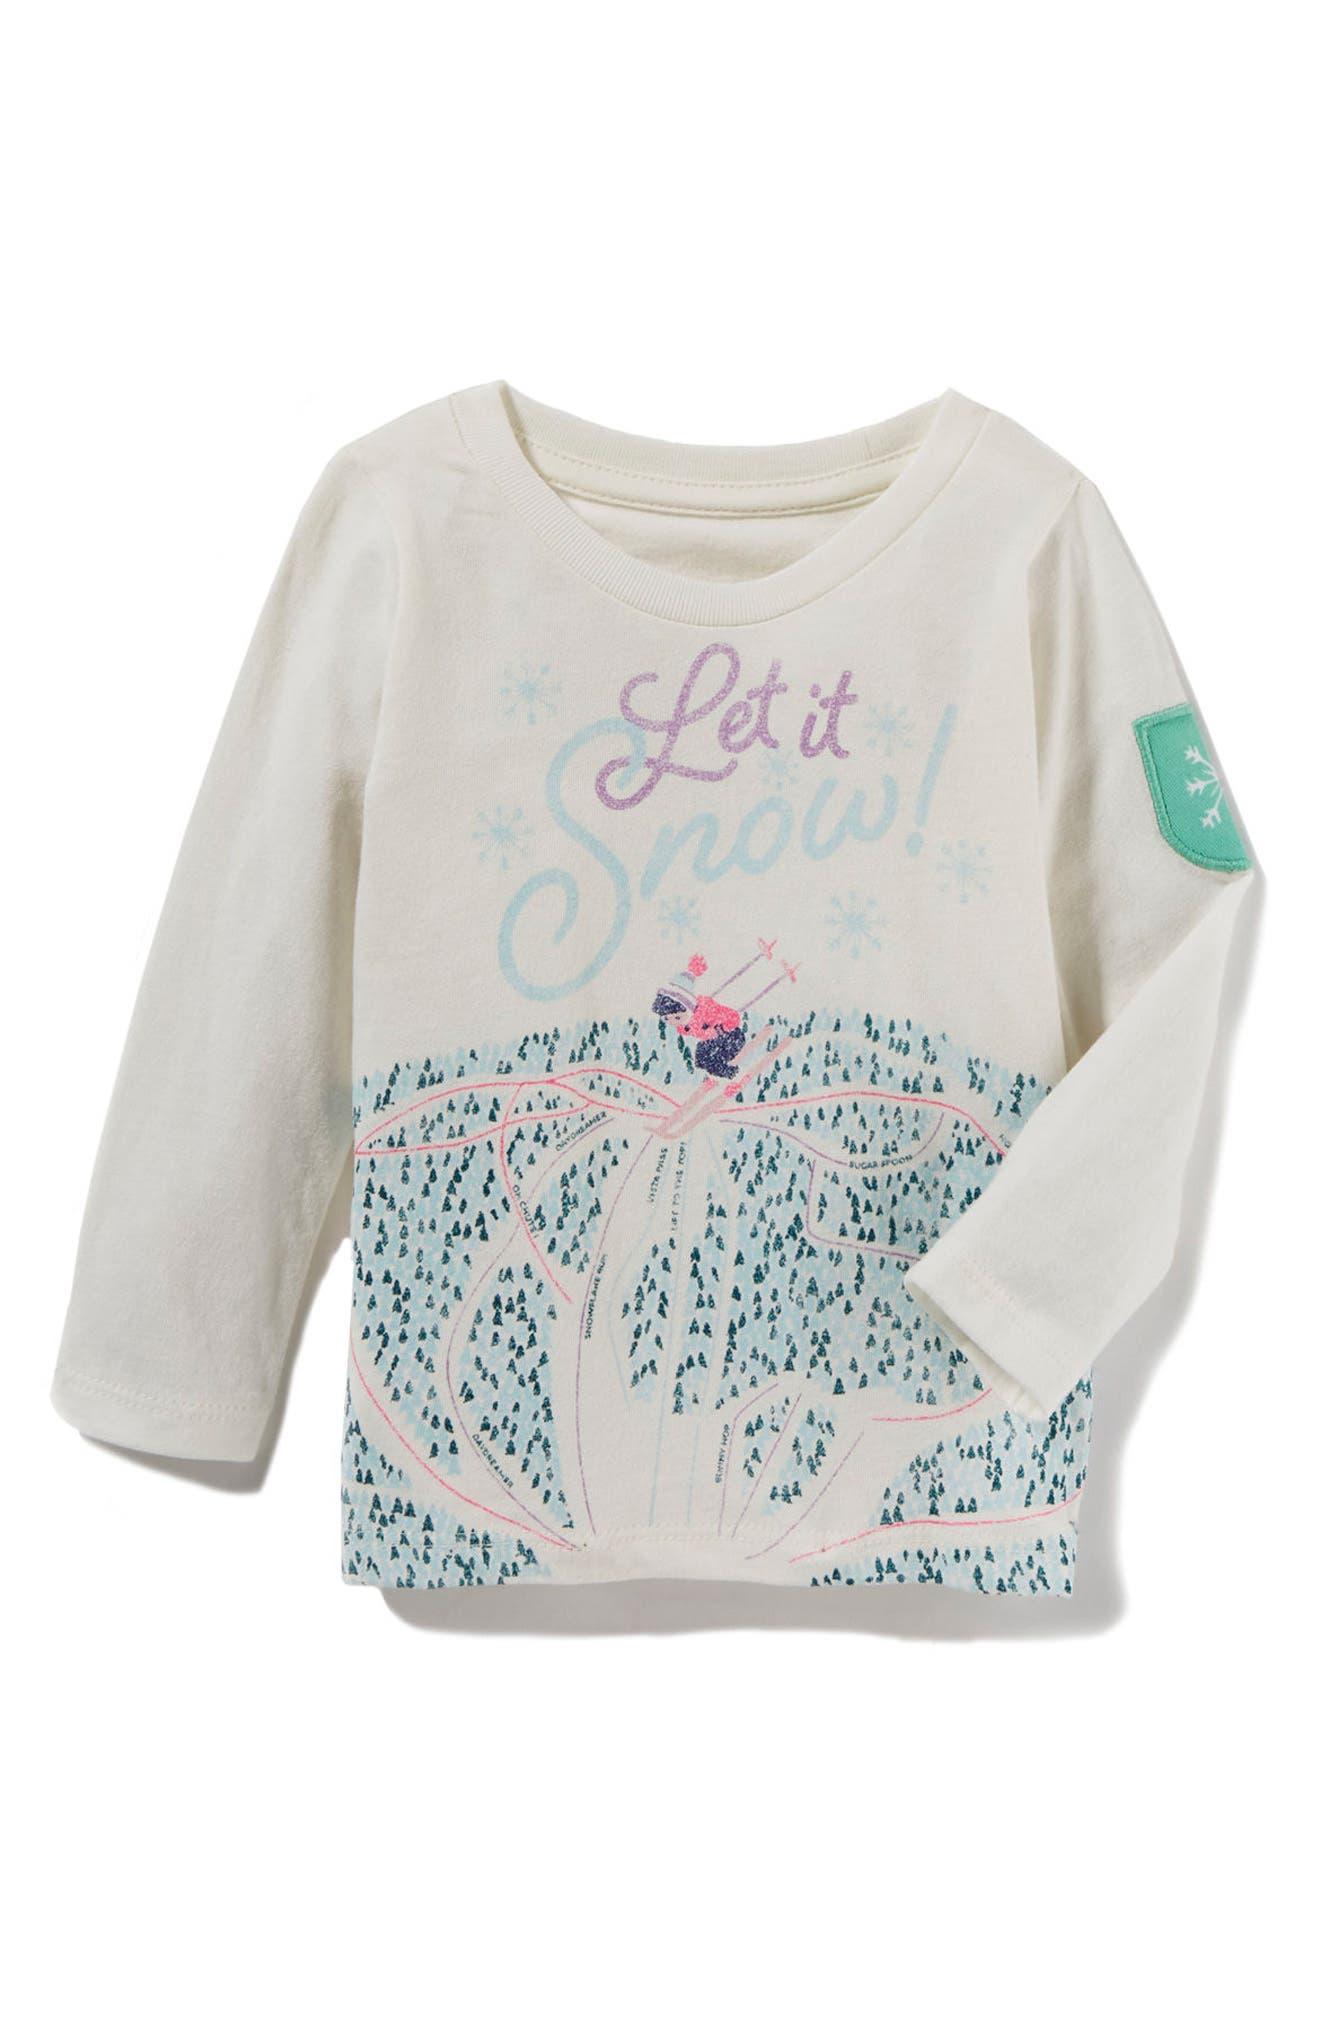 Peek Let It Snow Graphic Tee (Baby Girls)